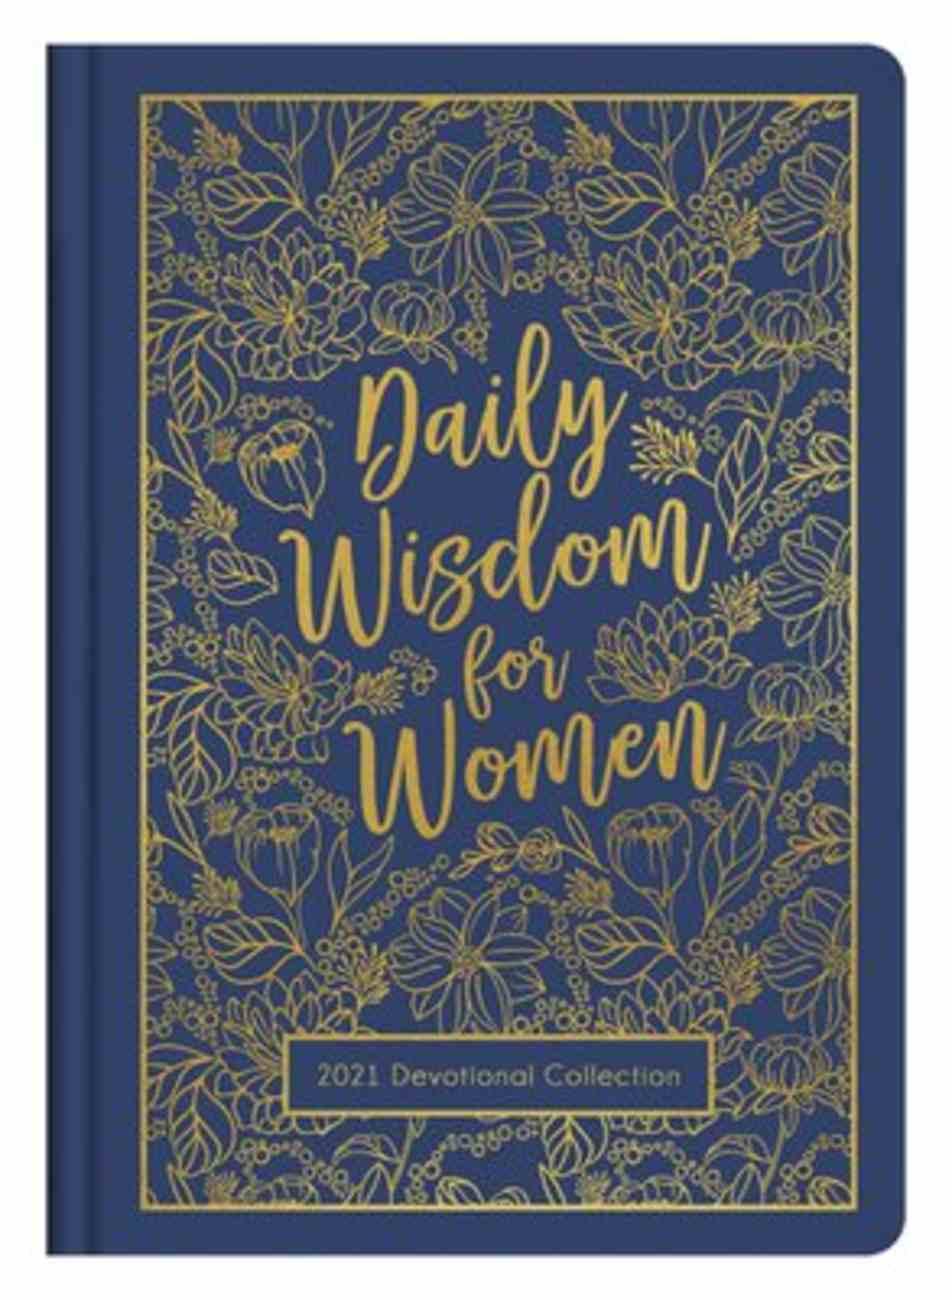 Daily Wisdom For Women 2021 Devotional Collection Hardback